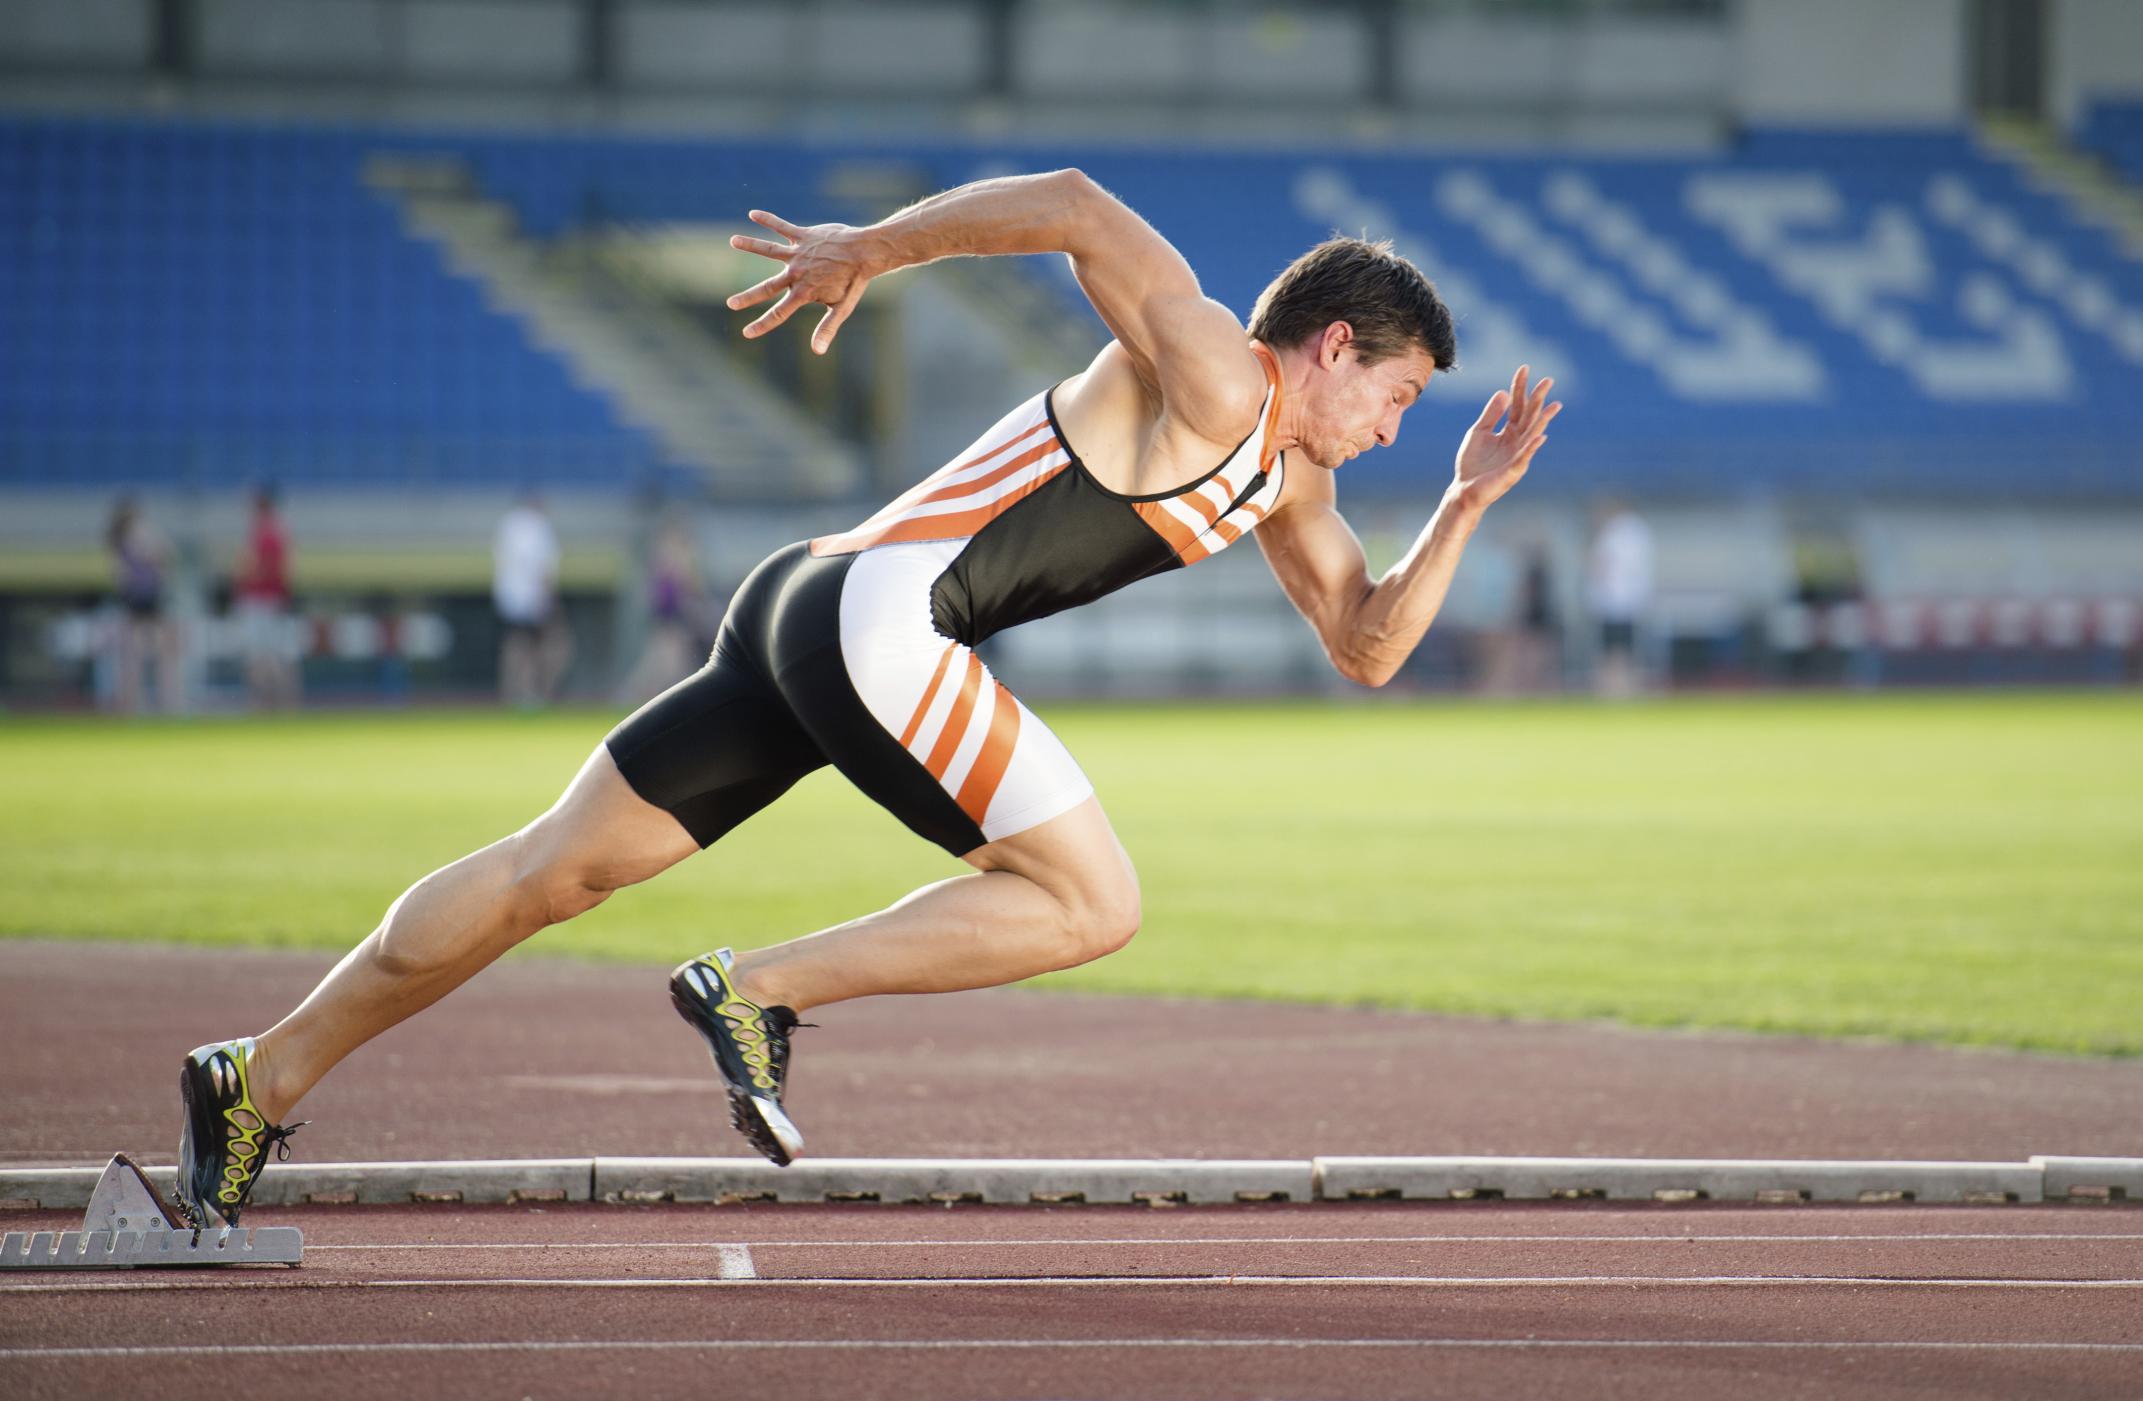 Hunter Bennett Performance. Acceleration, performance, speed, agility, strength, power, athletic development.